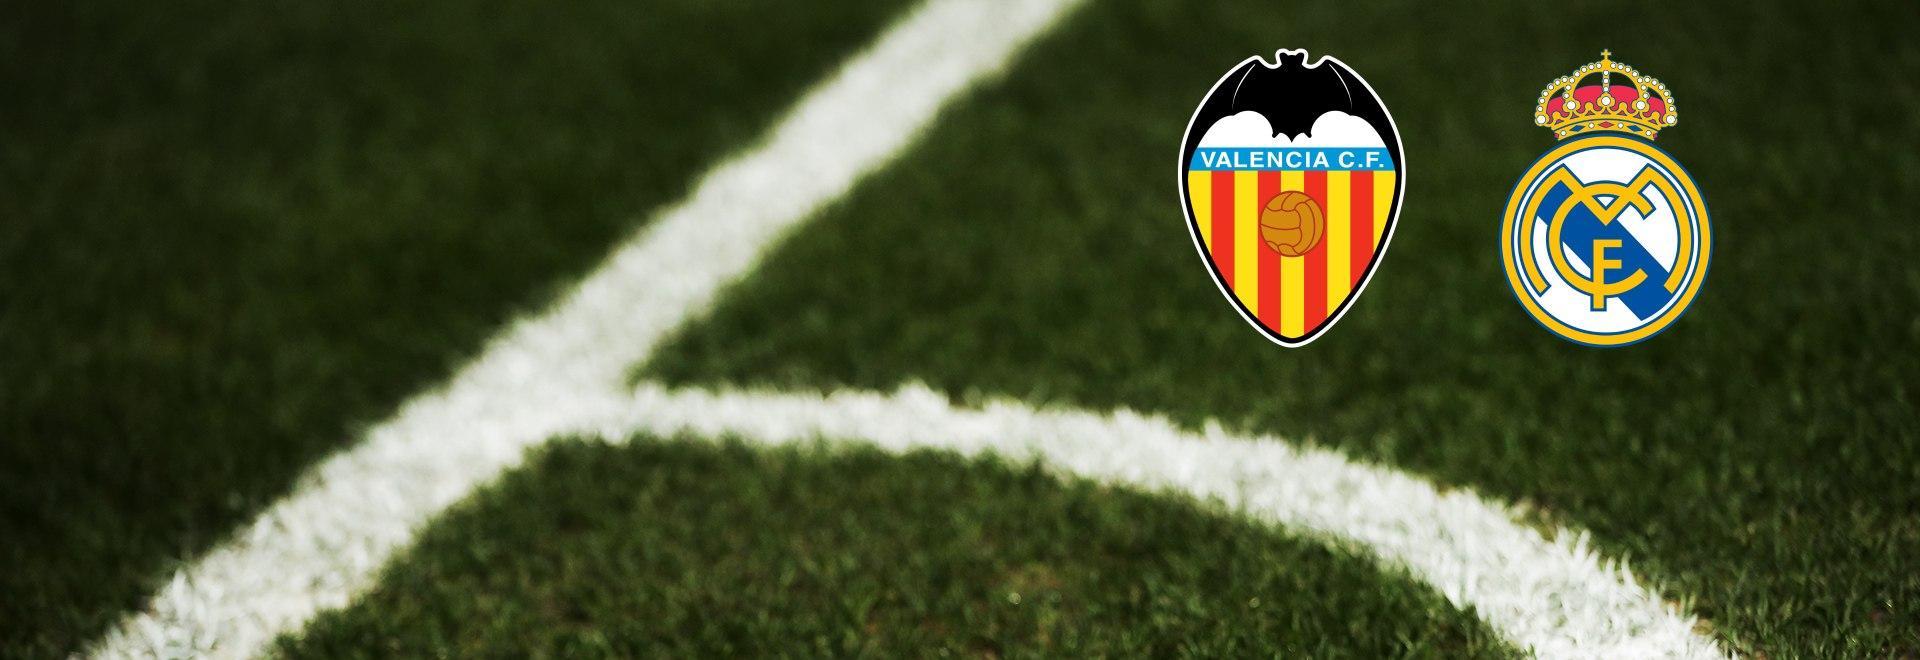 Valencia - Real Madrid. 17a g.